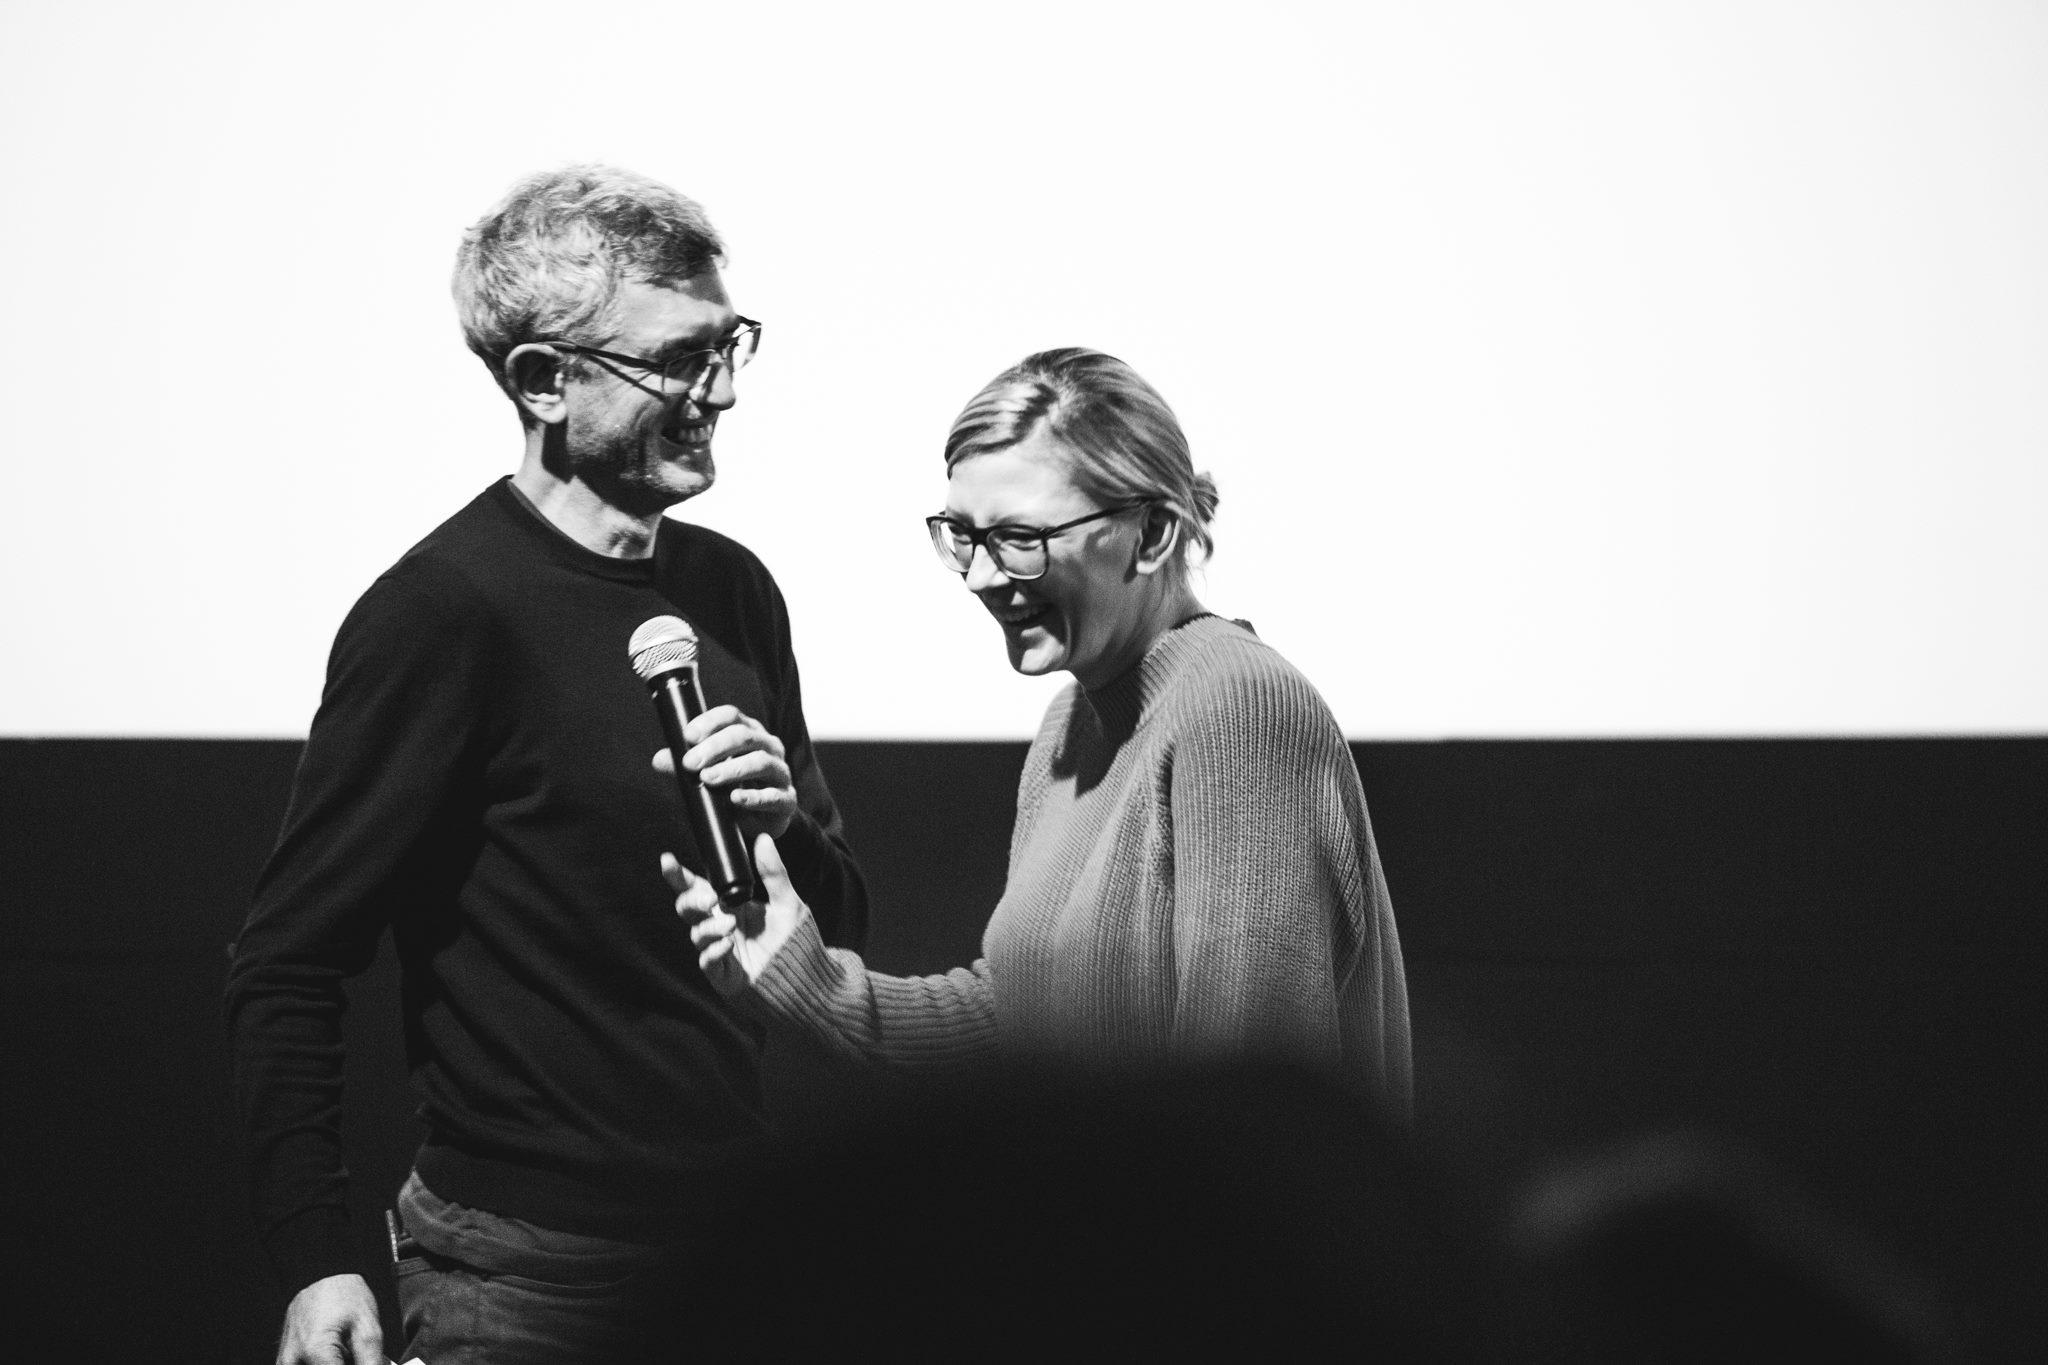 Kotryna Lingienė hands over in Vilnius... Photo by Tautvydas Stukas. .jpg